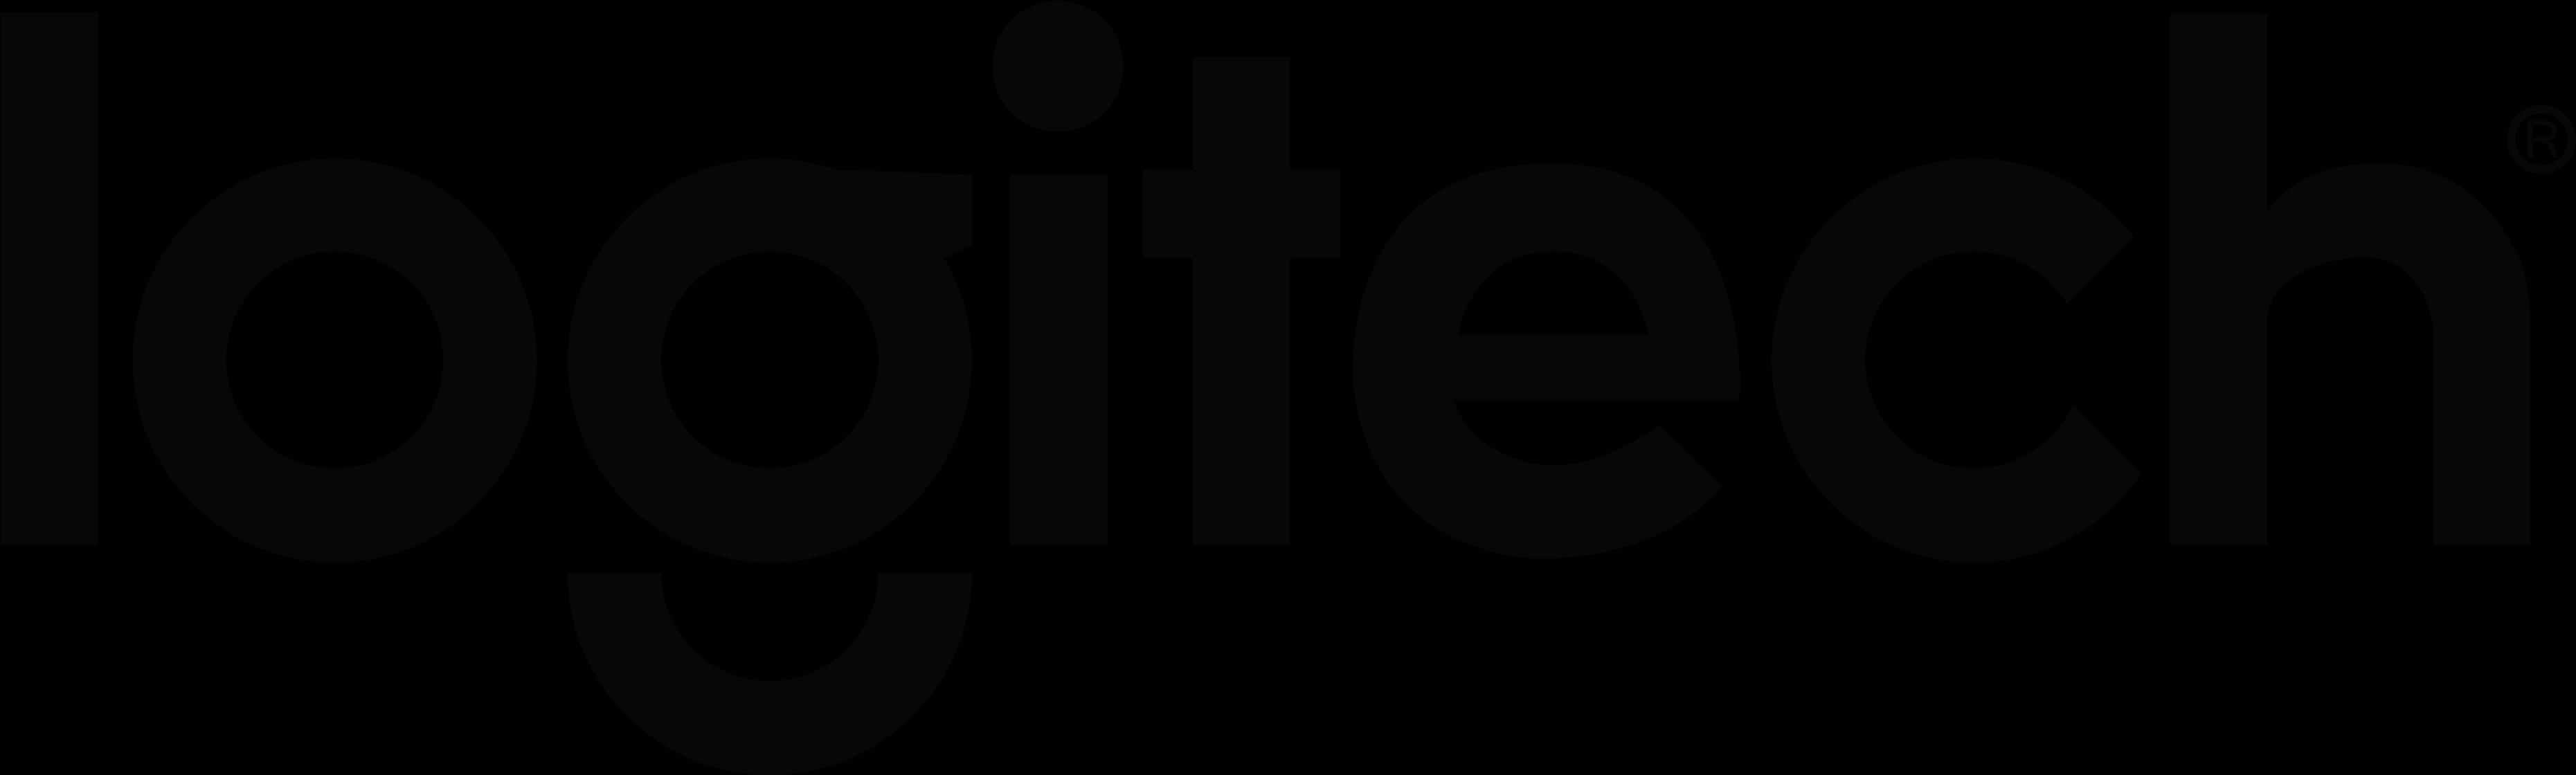 Logitech Zoom Hardware Logo